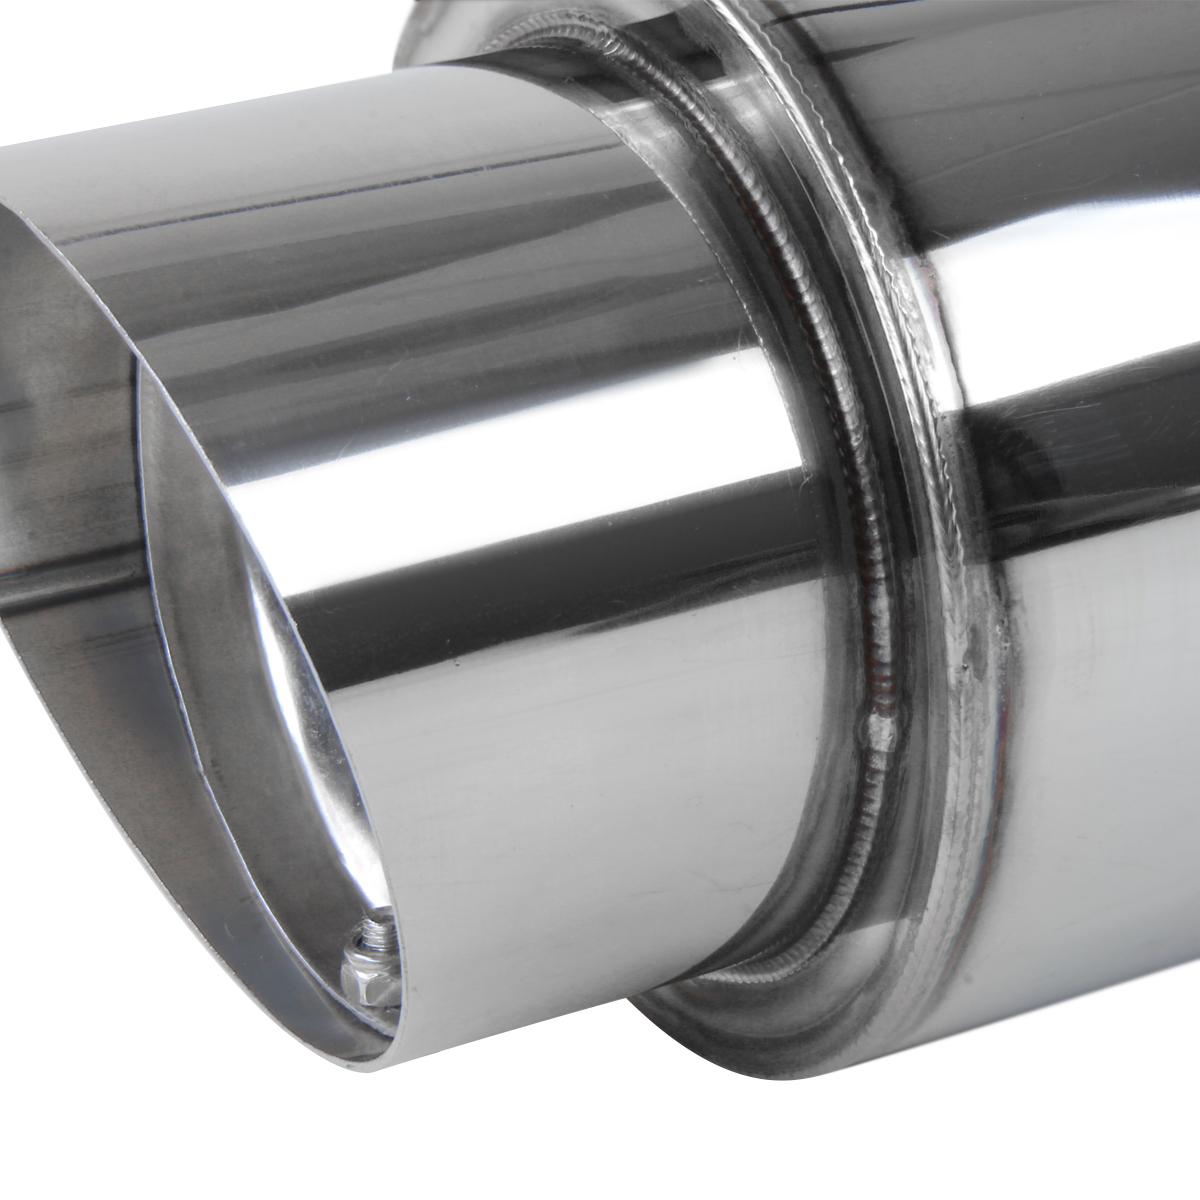 4-034-2-5-034-Inlet-Slant-Tip-Round-Chrome-Stainless-Steel-N1-Exhaust-Muffler